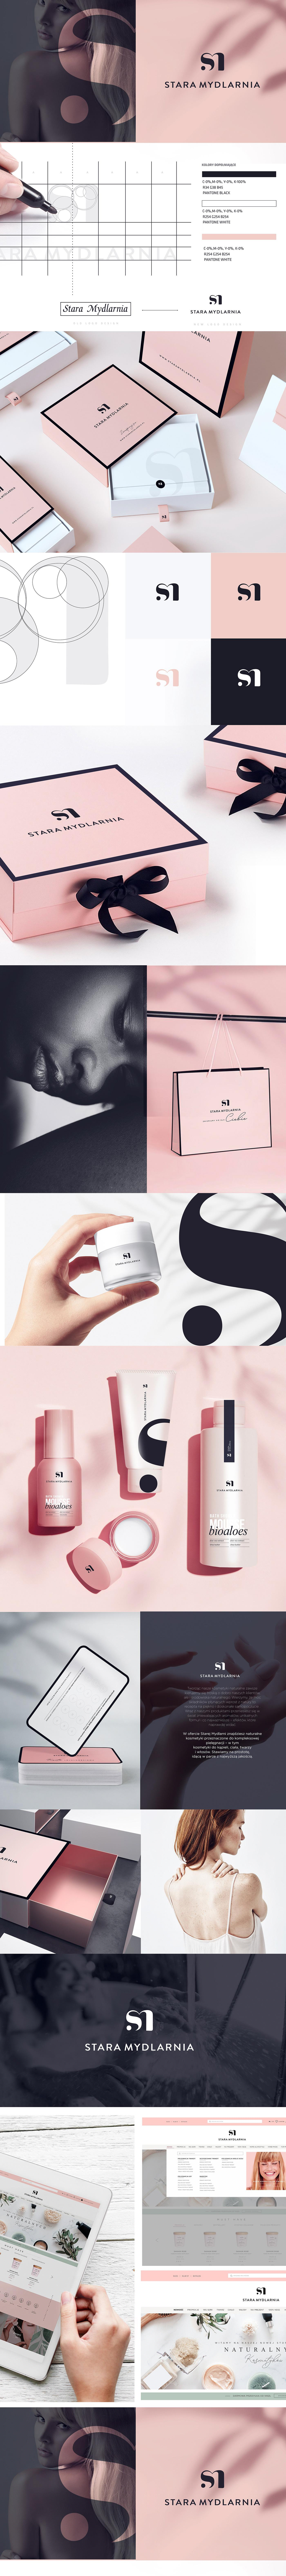 cosmetics heart logo Roses s  SM woman